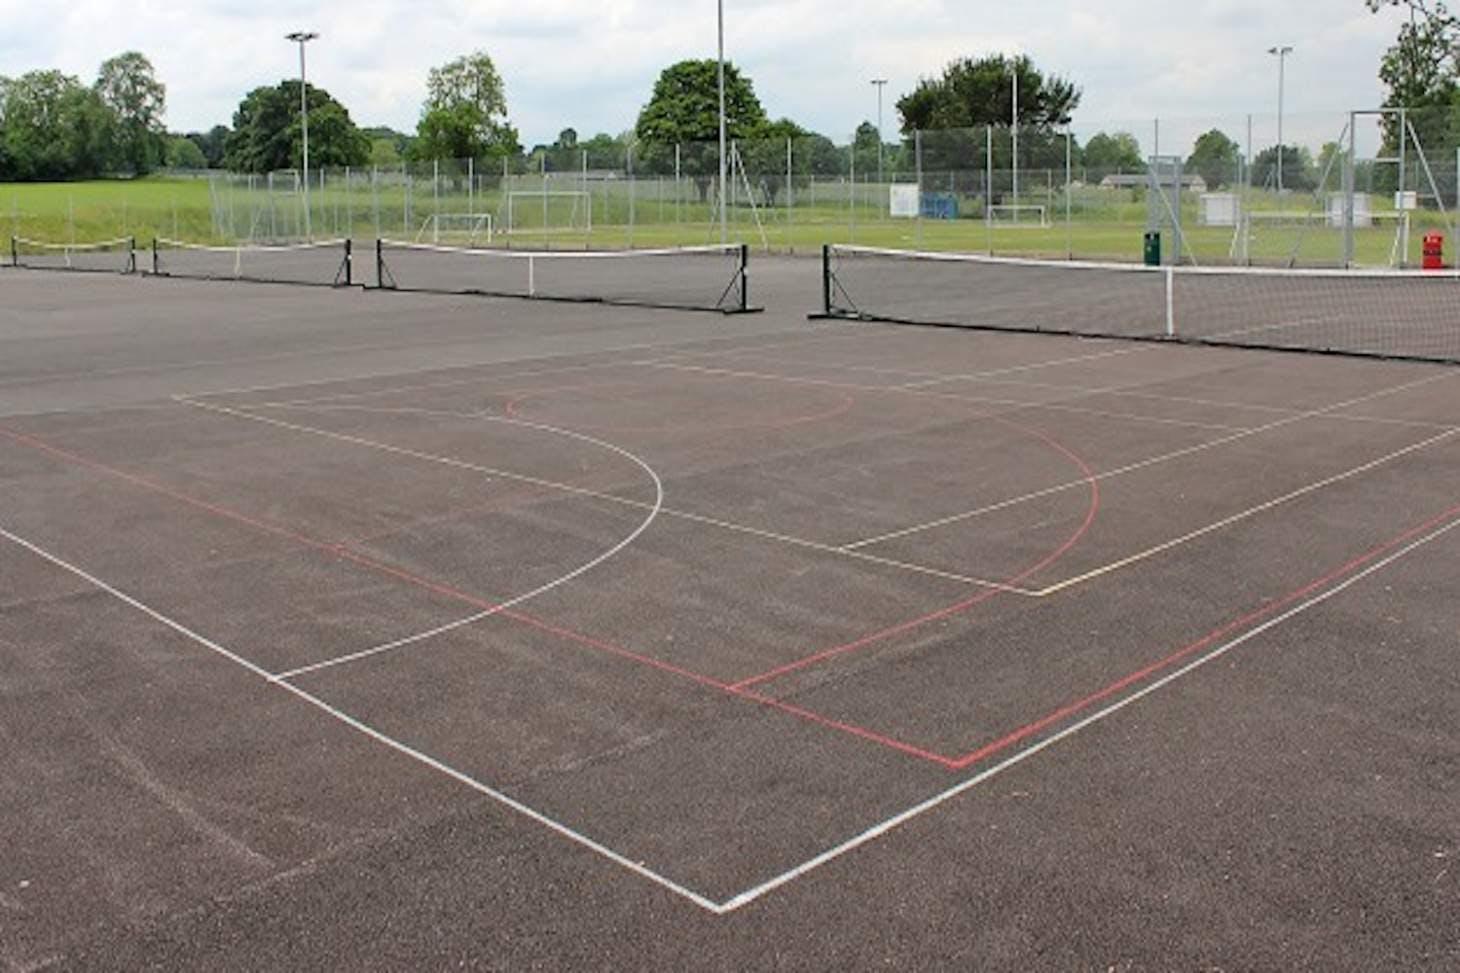 Harris Academy Purley Outdoor   Concrete tennis court